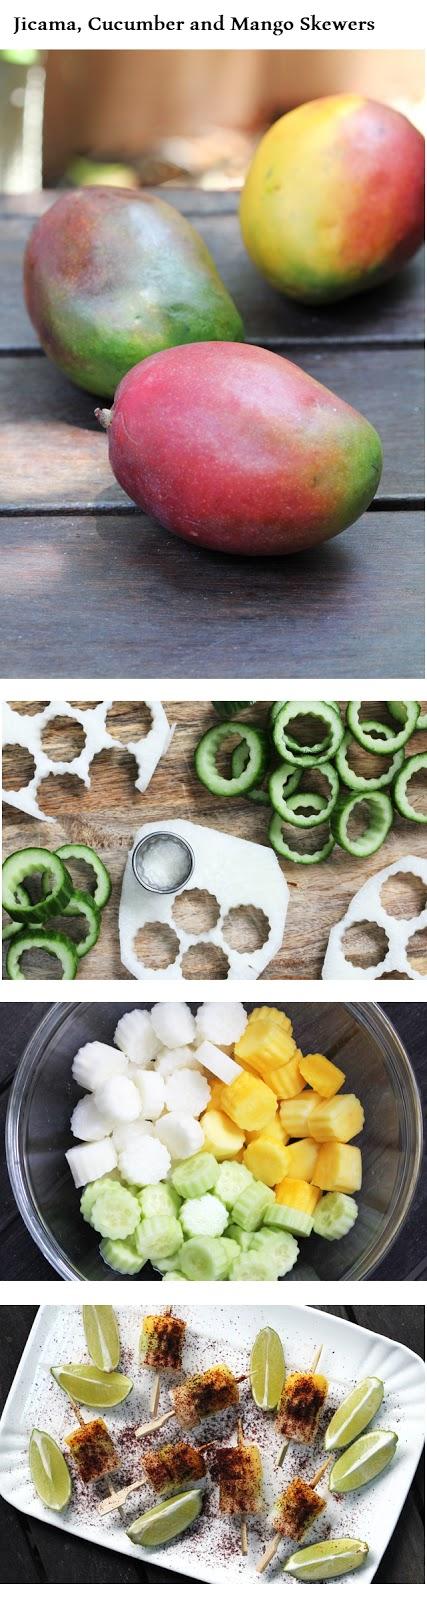 Recipe Sharing Community: Spiced Jicama, Cucumber and Mango Skewers   Recipe Sharing Community